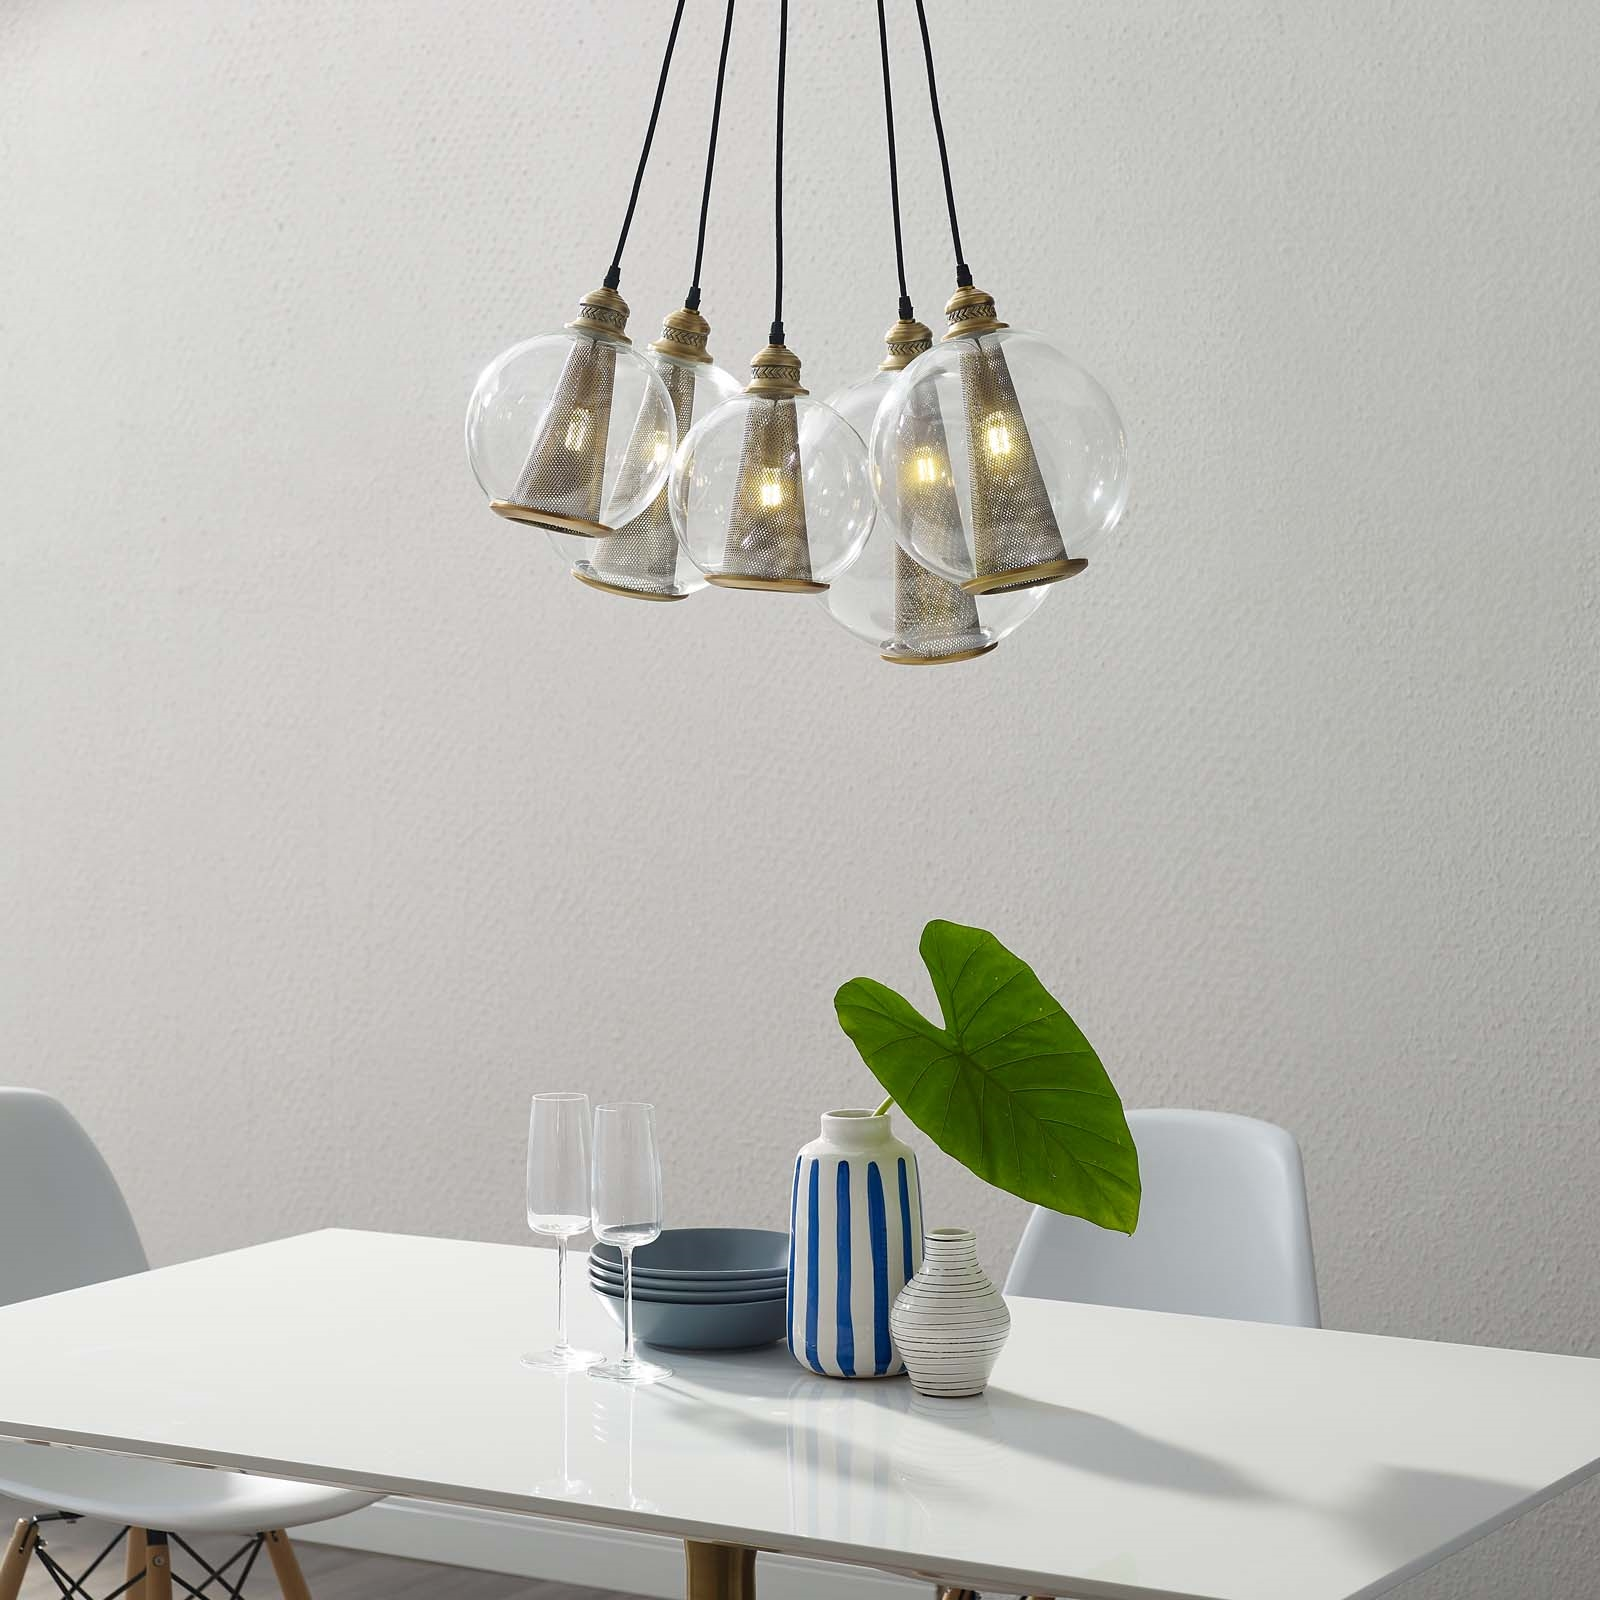 Peak Brass Cone And Glass Globe Cluster Pendant Light Chandelier